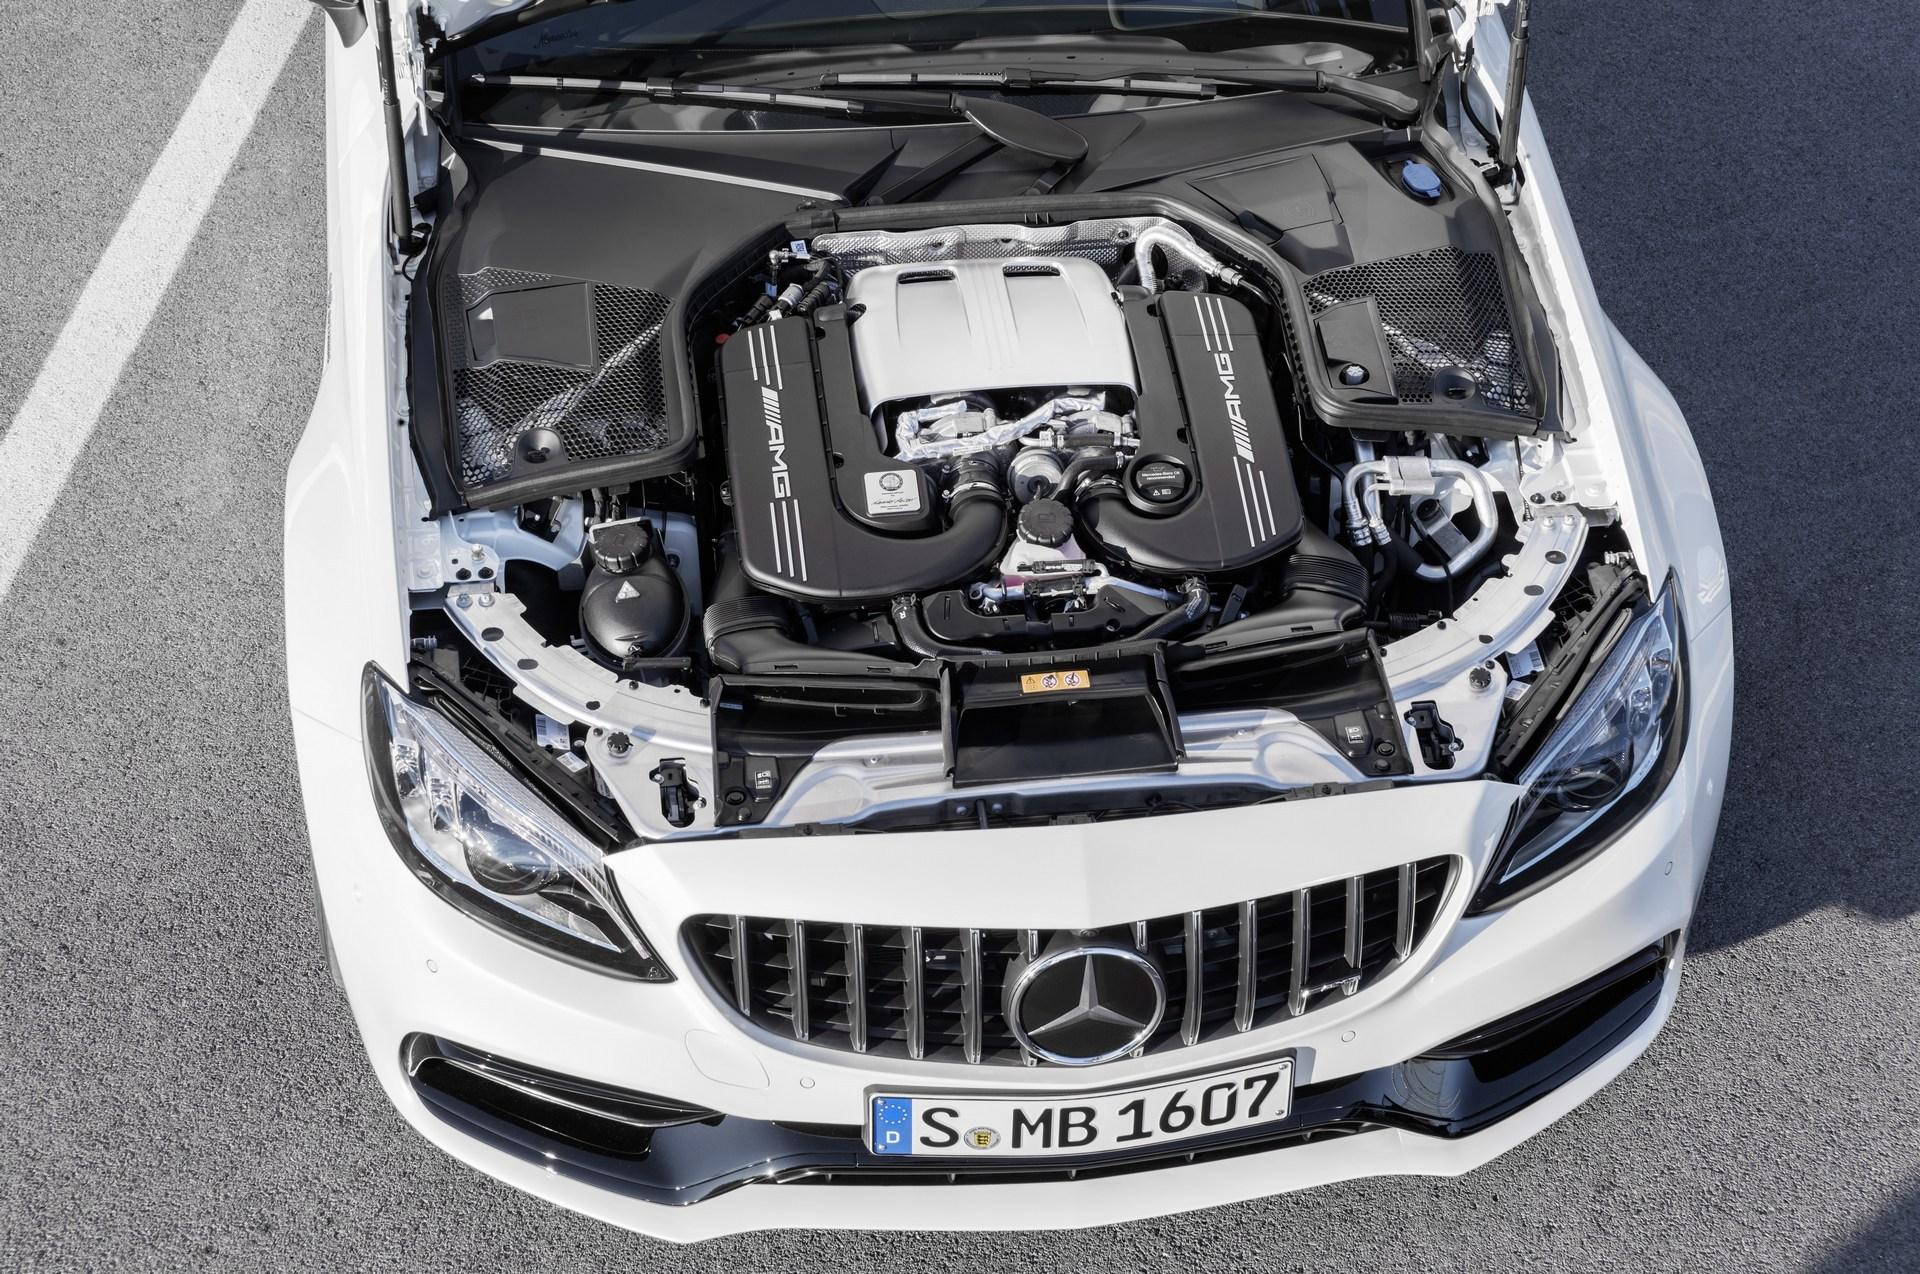 Mercedes-AMG-C63-Coupe-22.jpg